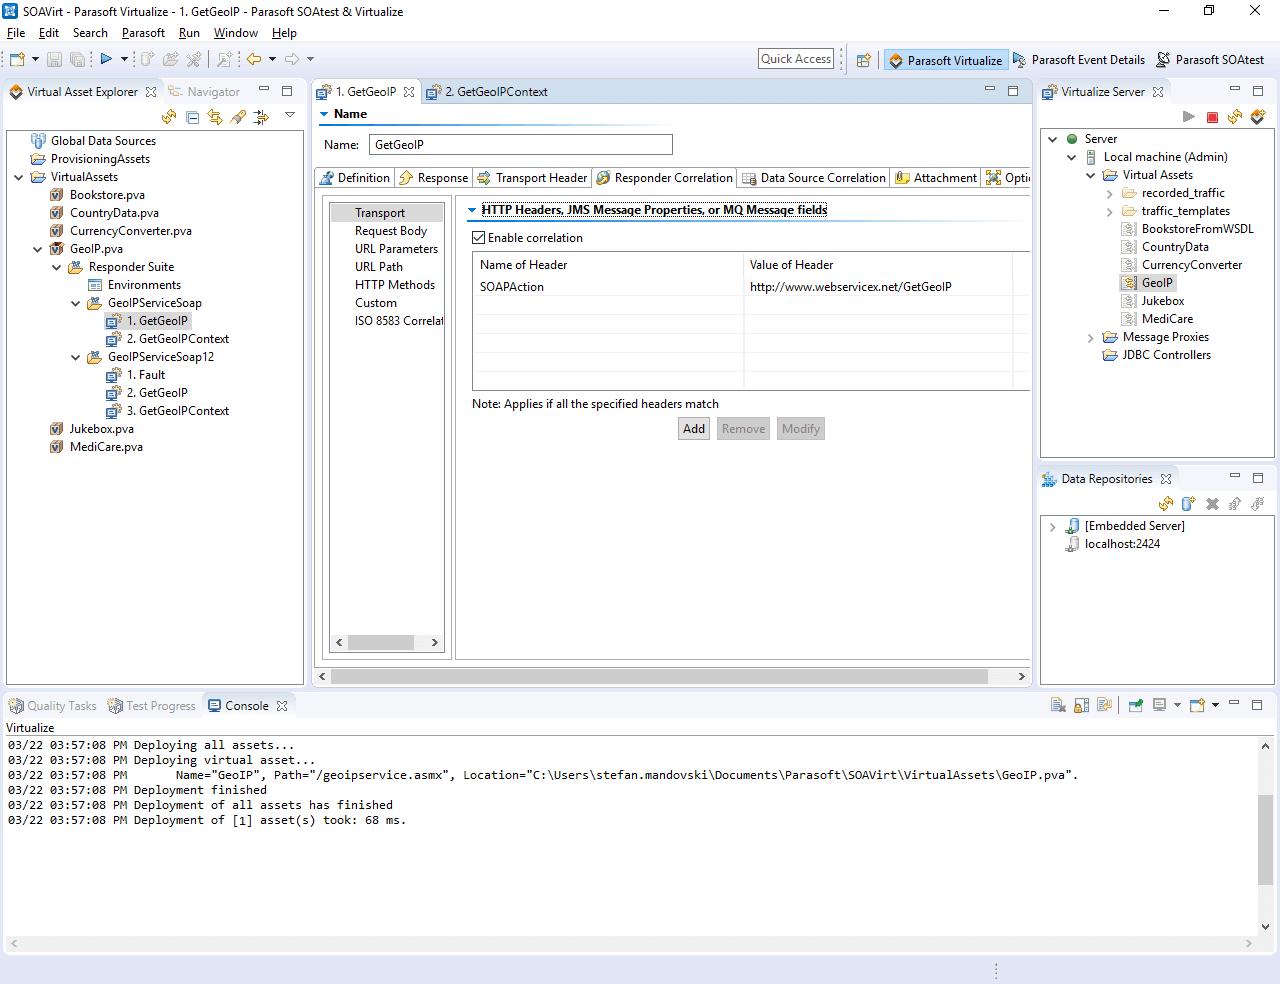 Parasoft Virtualize UI upon successful deployment of a virtual asset